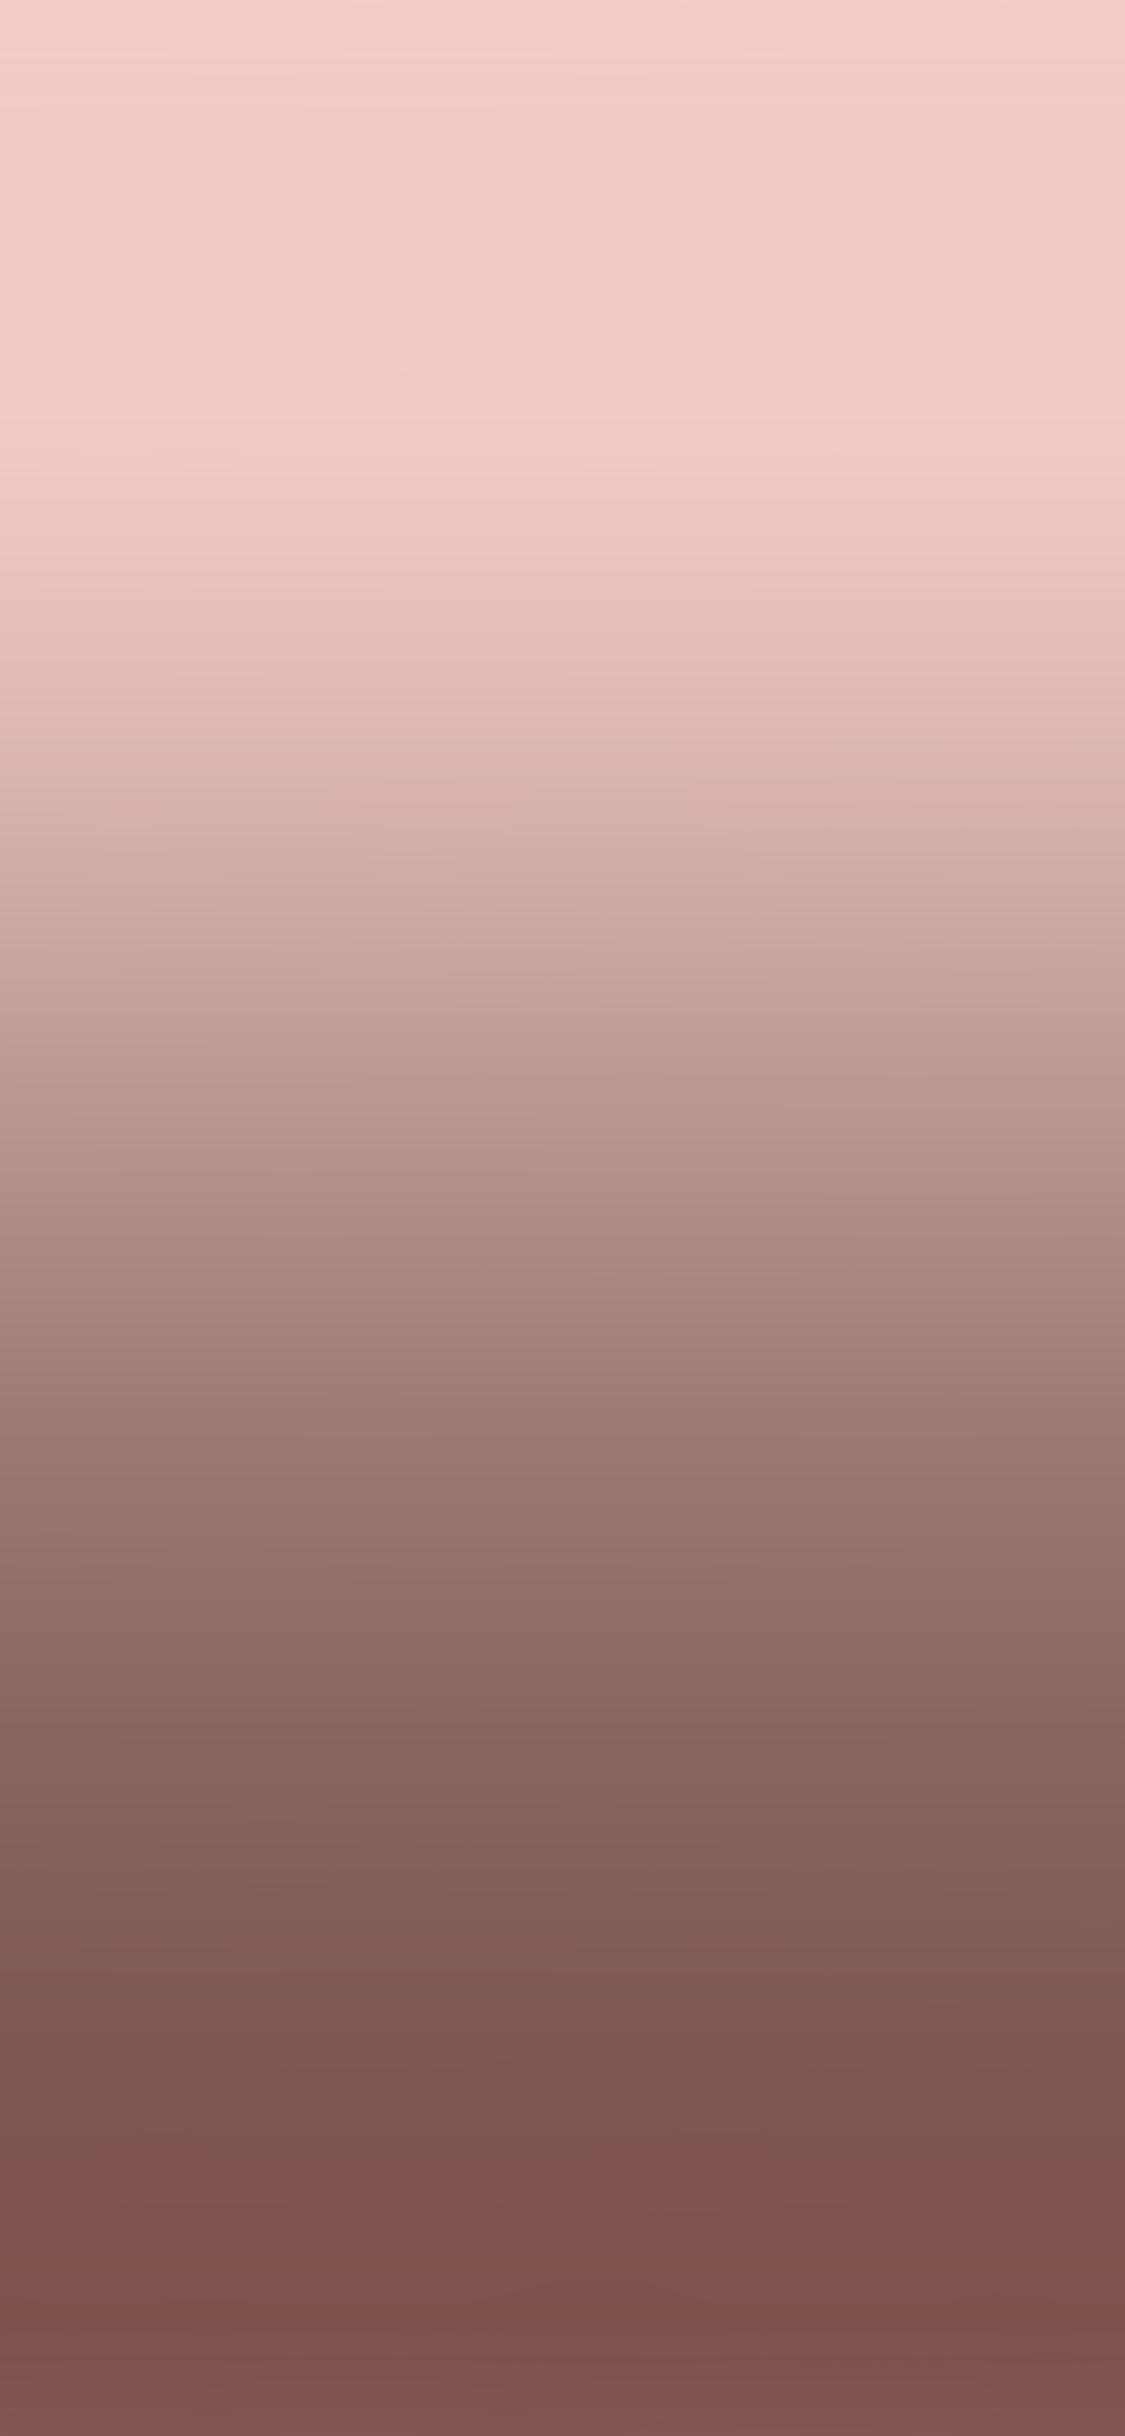 Iphonexpapers Com Iphone X Wallpaper Sj97 Rose Gold Pink